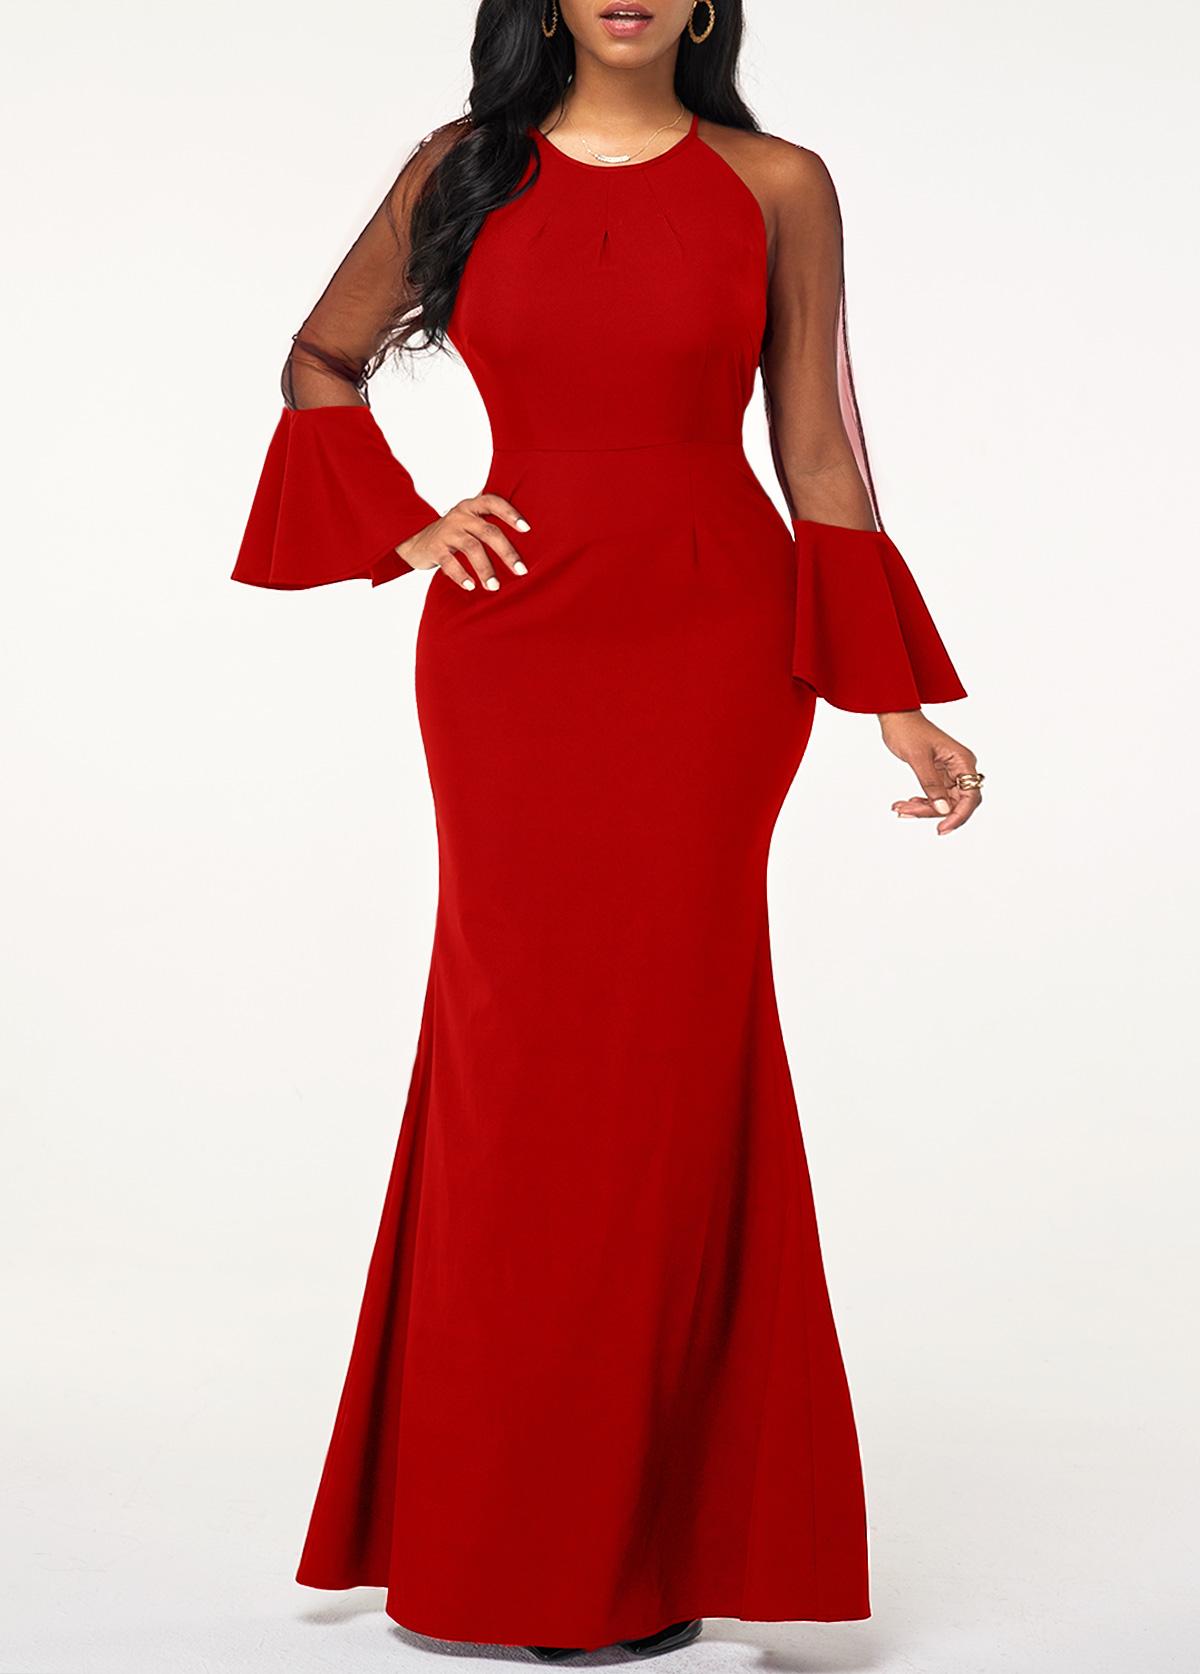 Mesh Panel Flare Cuff Red Maxi Dress